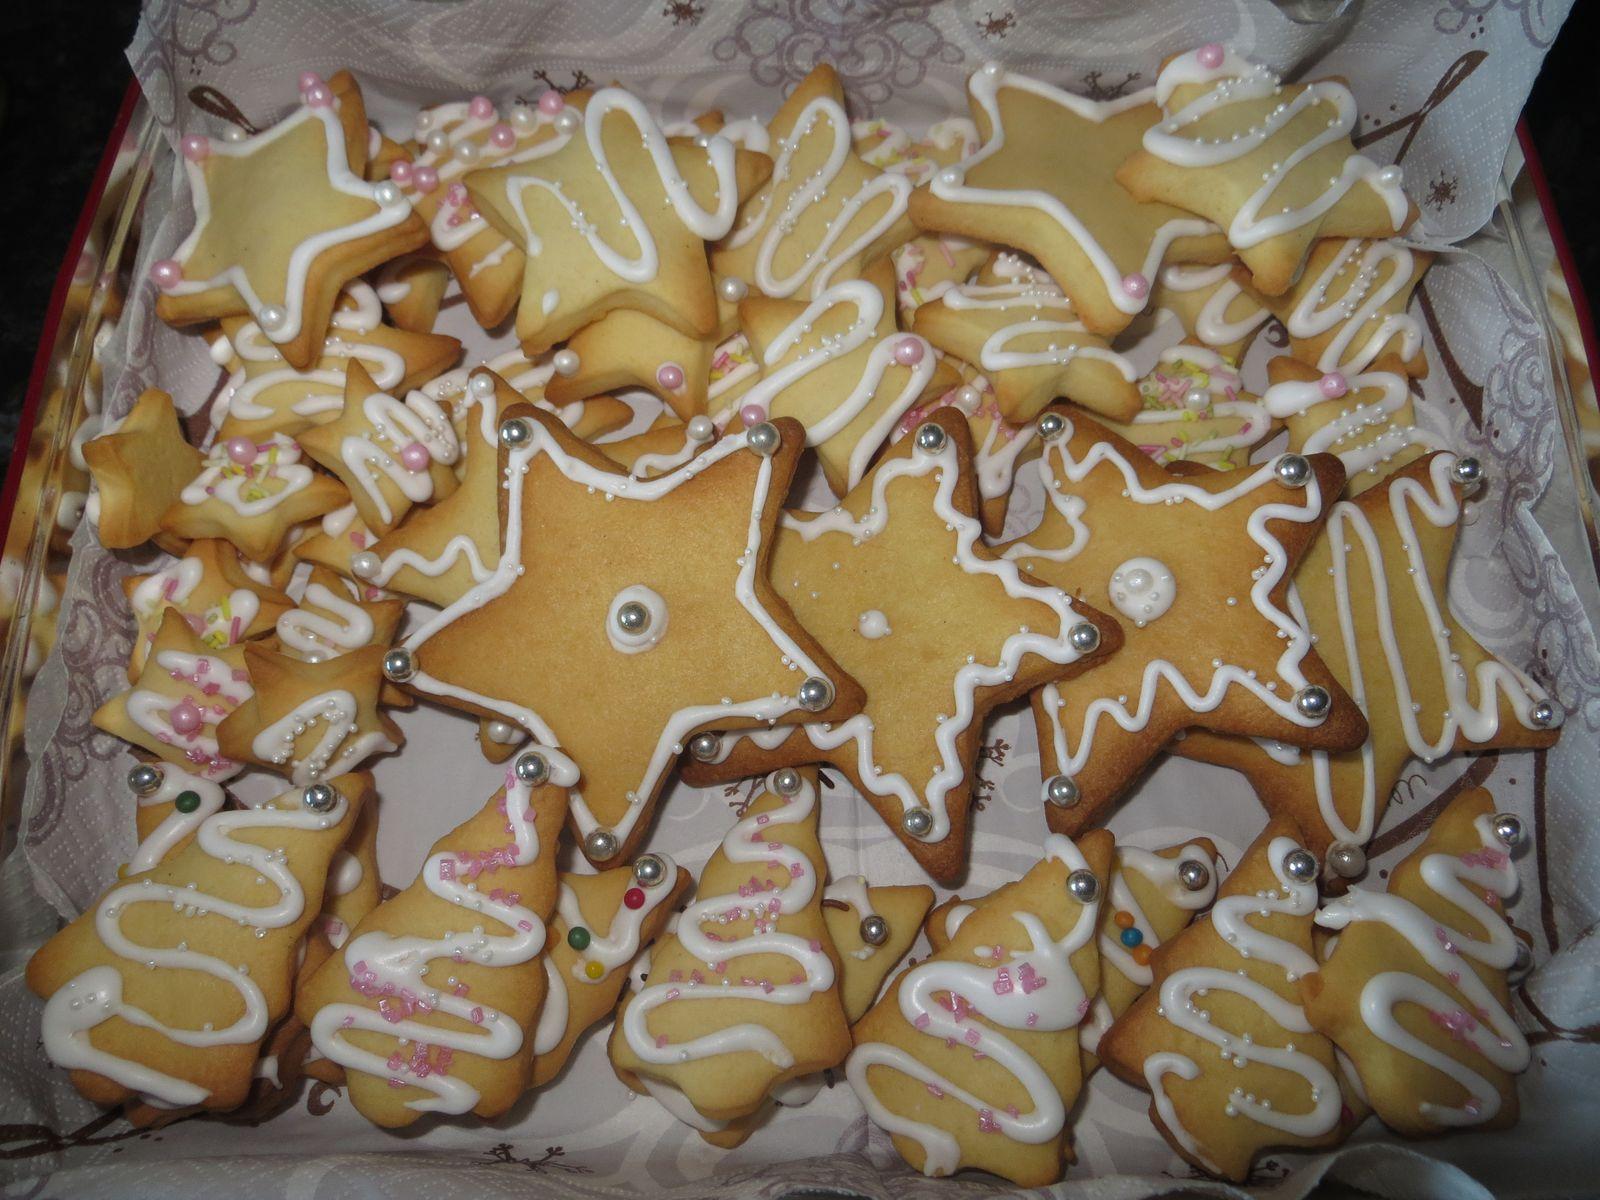 Butterbredelés ,petits biscuits au beurre alsacien